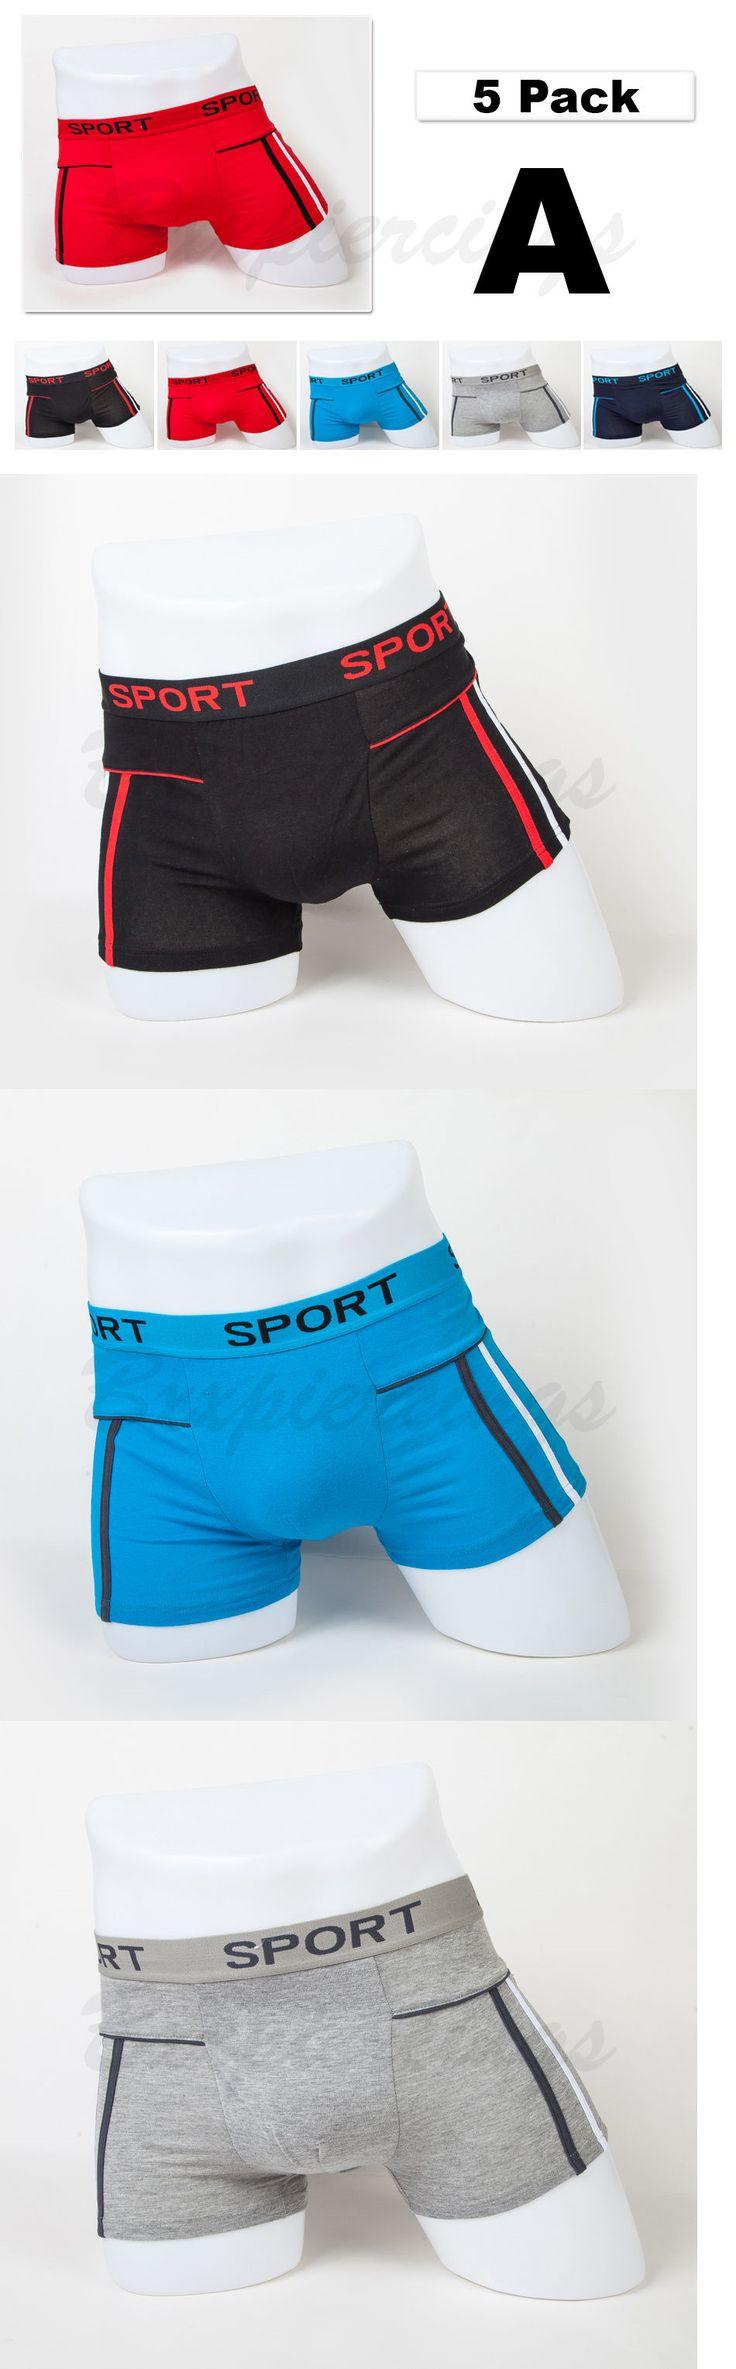 Man Underwear: 5 Pack Mens Boxer Briefs Cotton Underwear Stretch Trunk Short Bulge Lot Xs S M L -> BUY IT NOW ONLY: $10.78 on eBay!